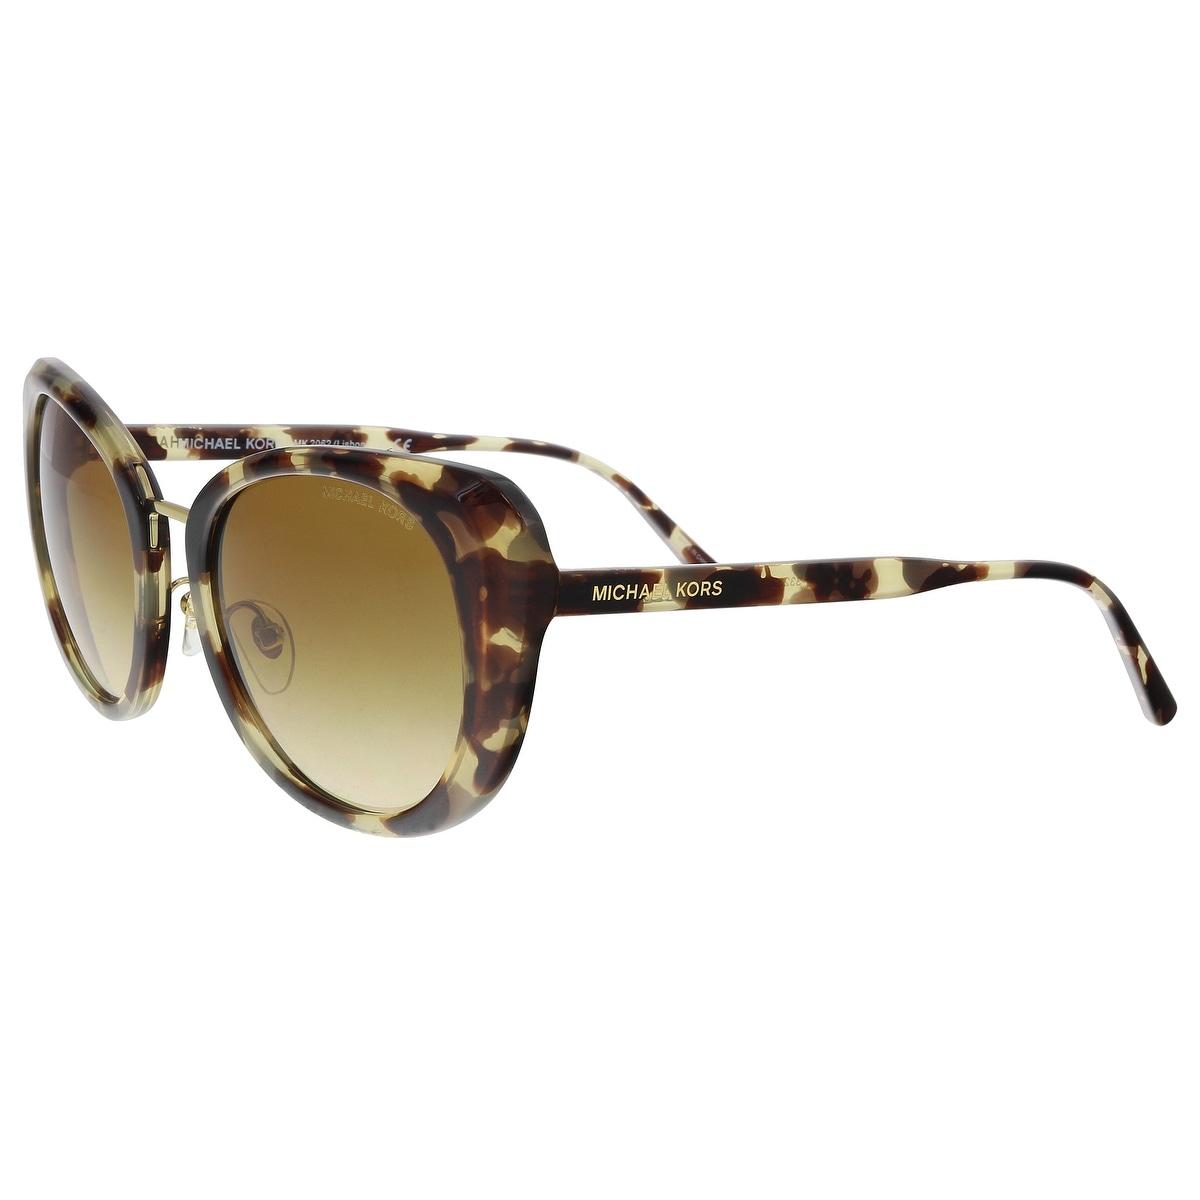 ca1a34de4eec Michael Kors Sunglasses | Shop our Best Clothing & Shoes Deals Online at  Overstock